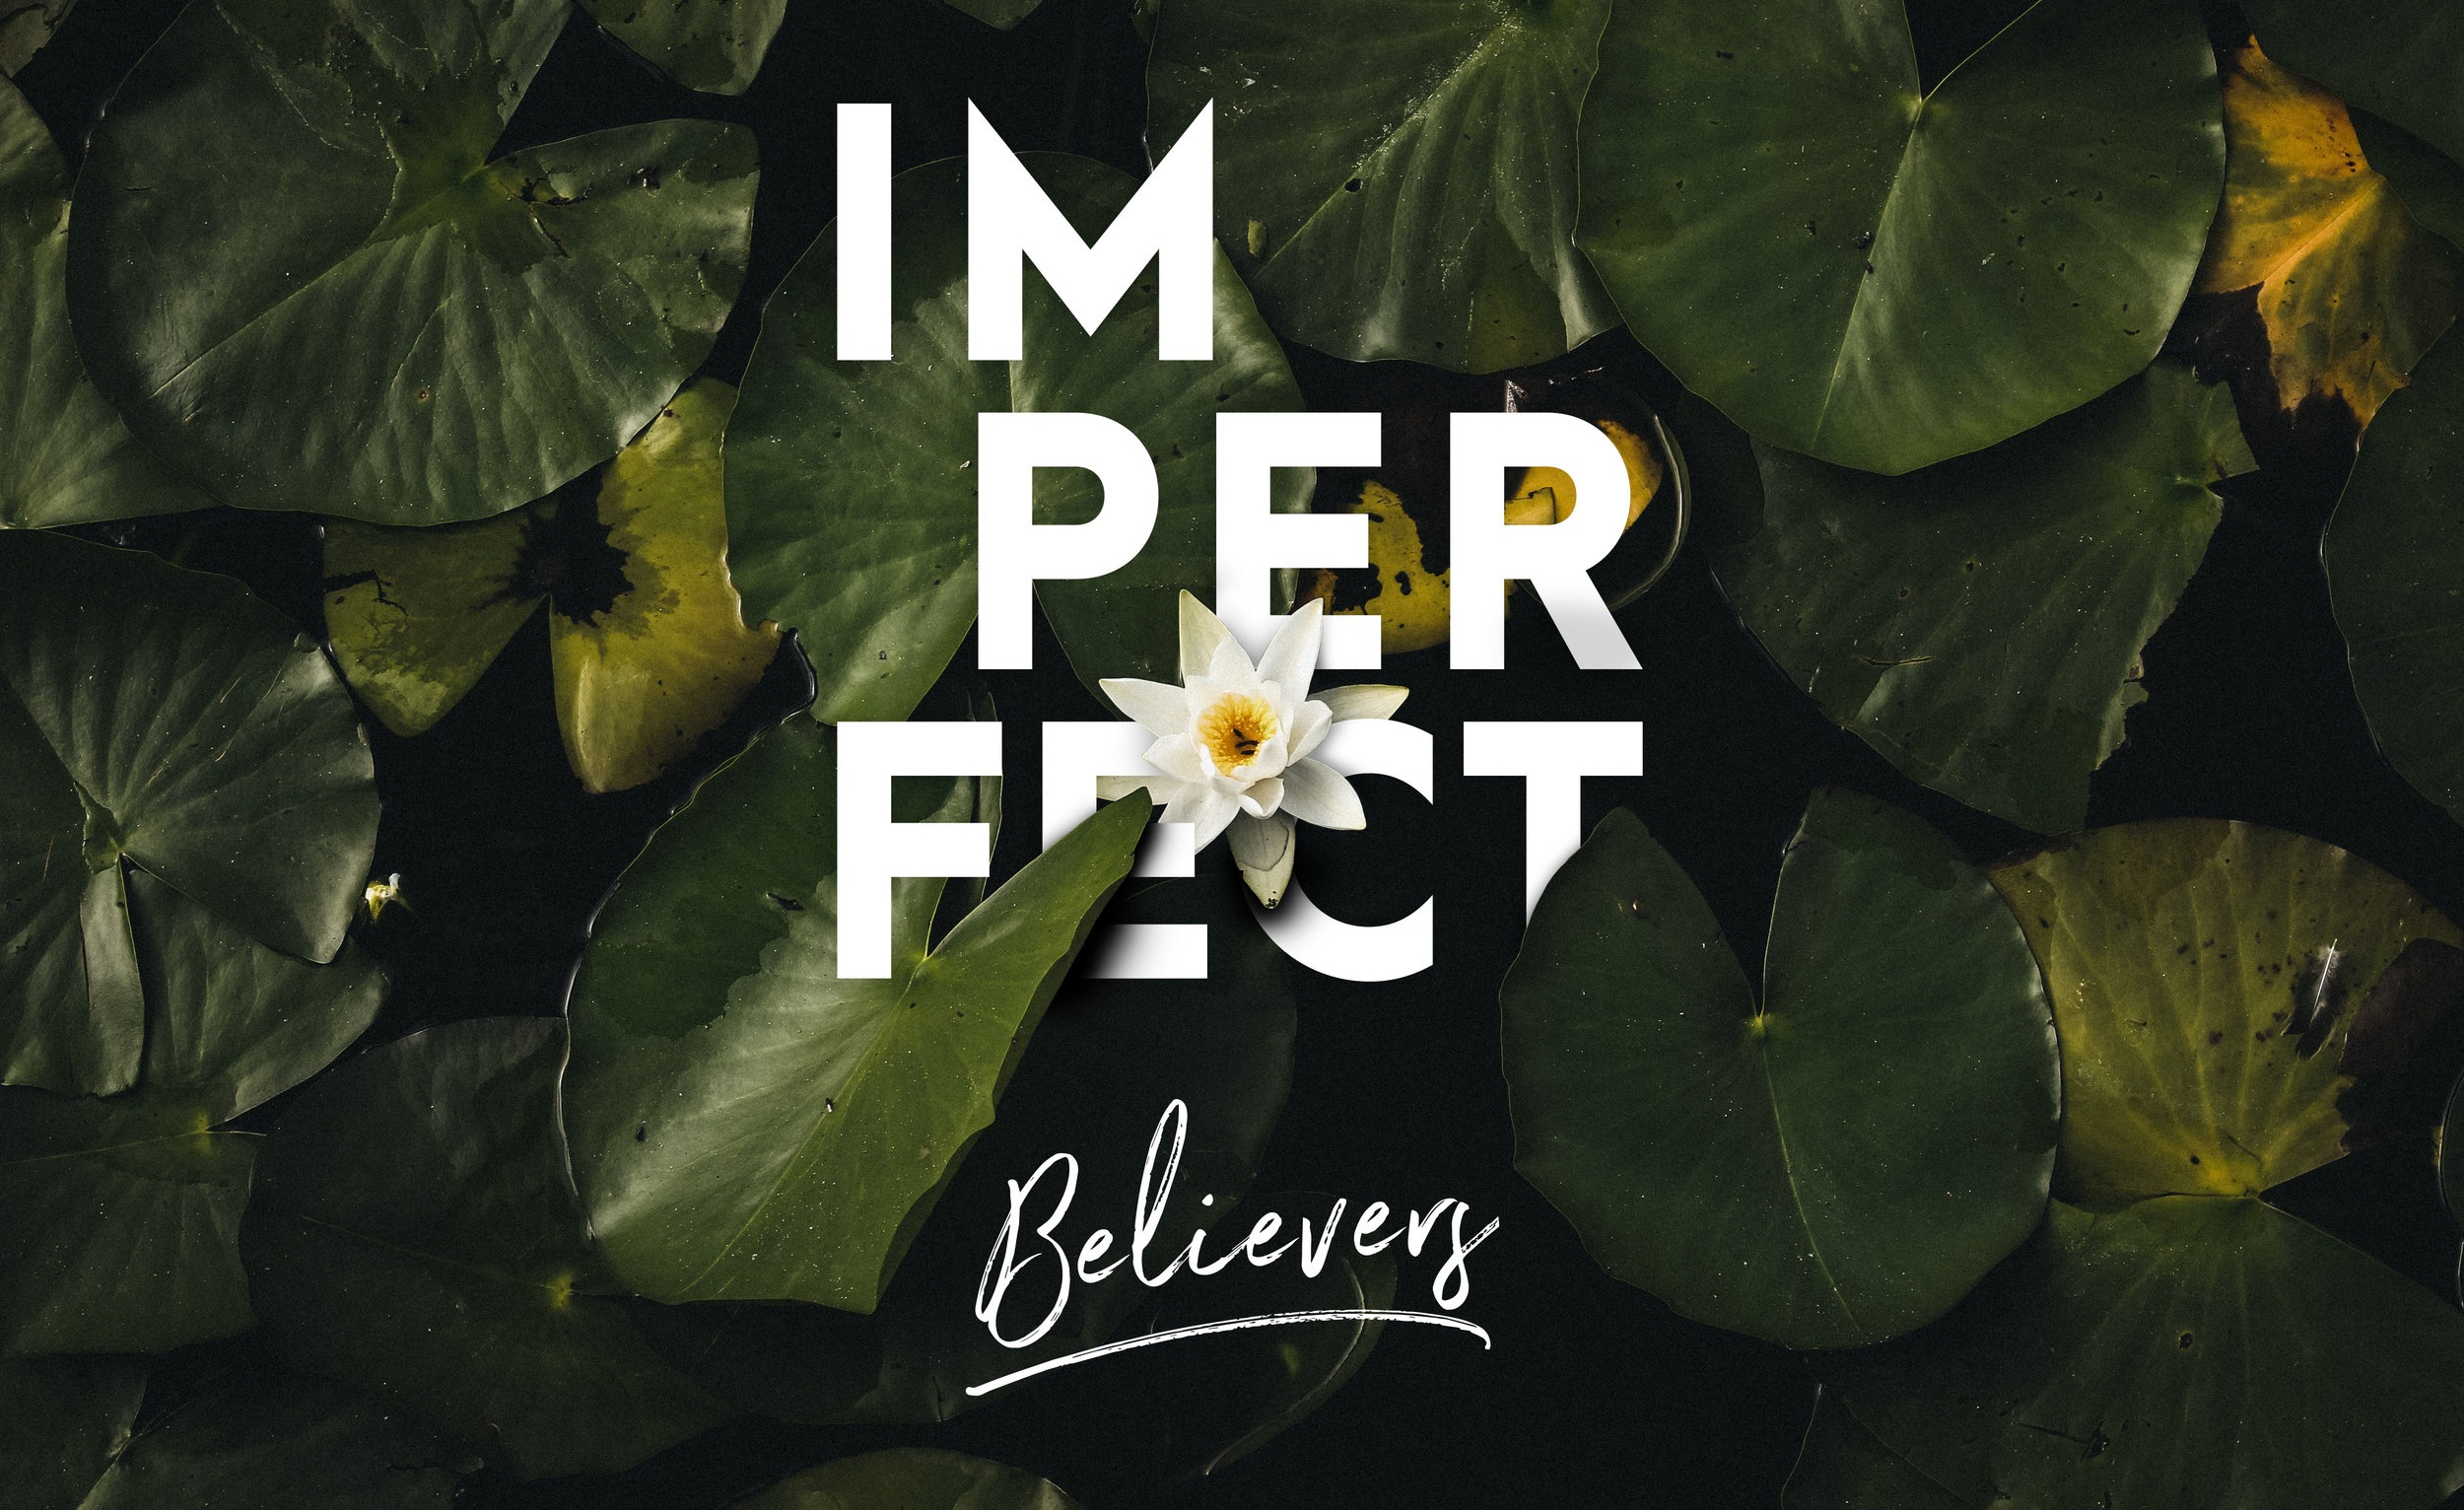 Imperfect+Believers2.jpg